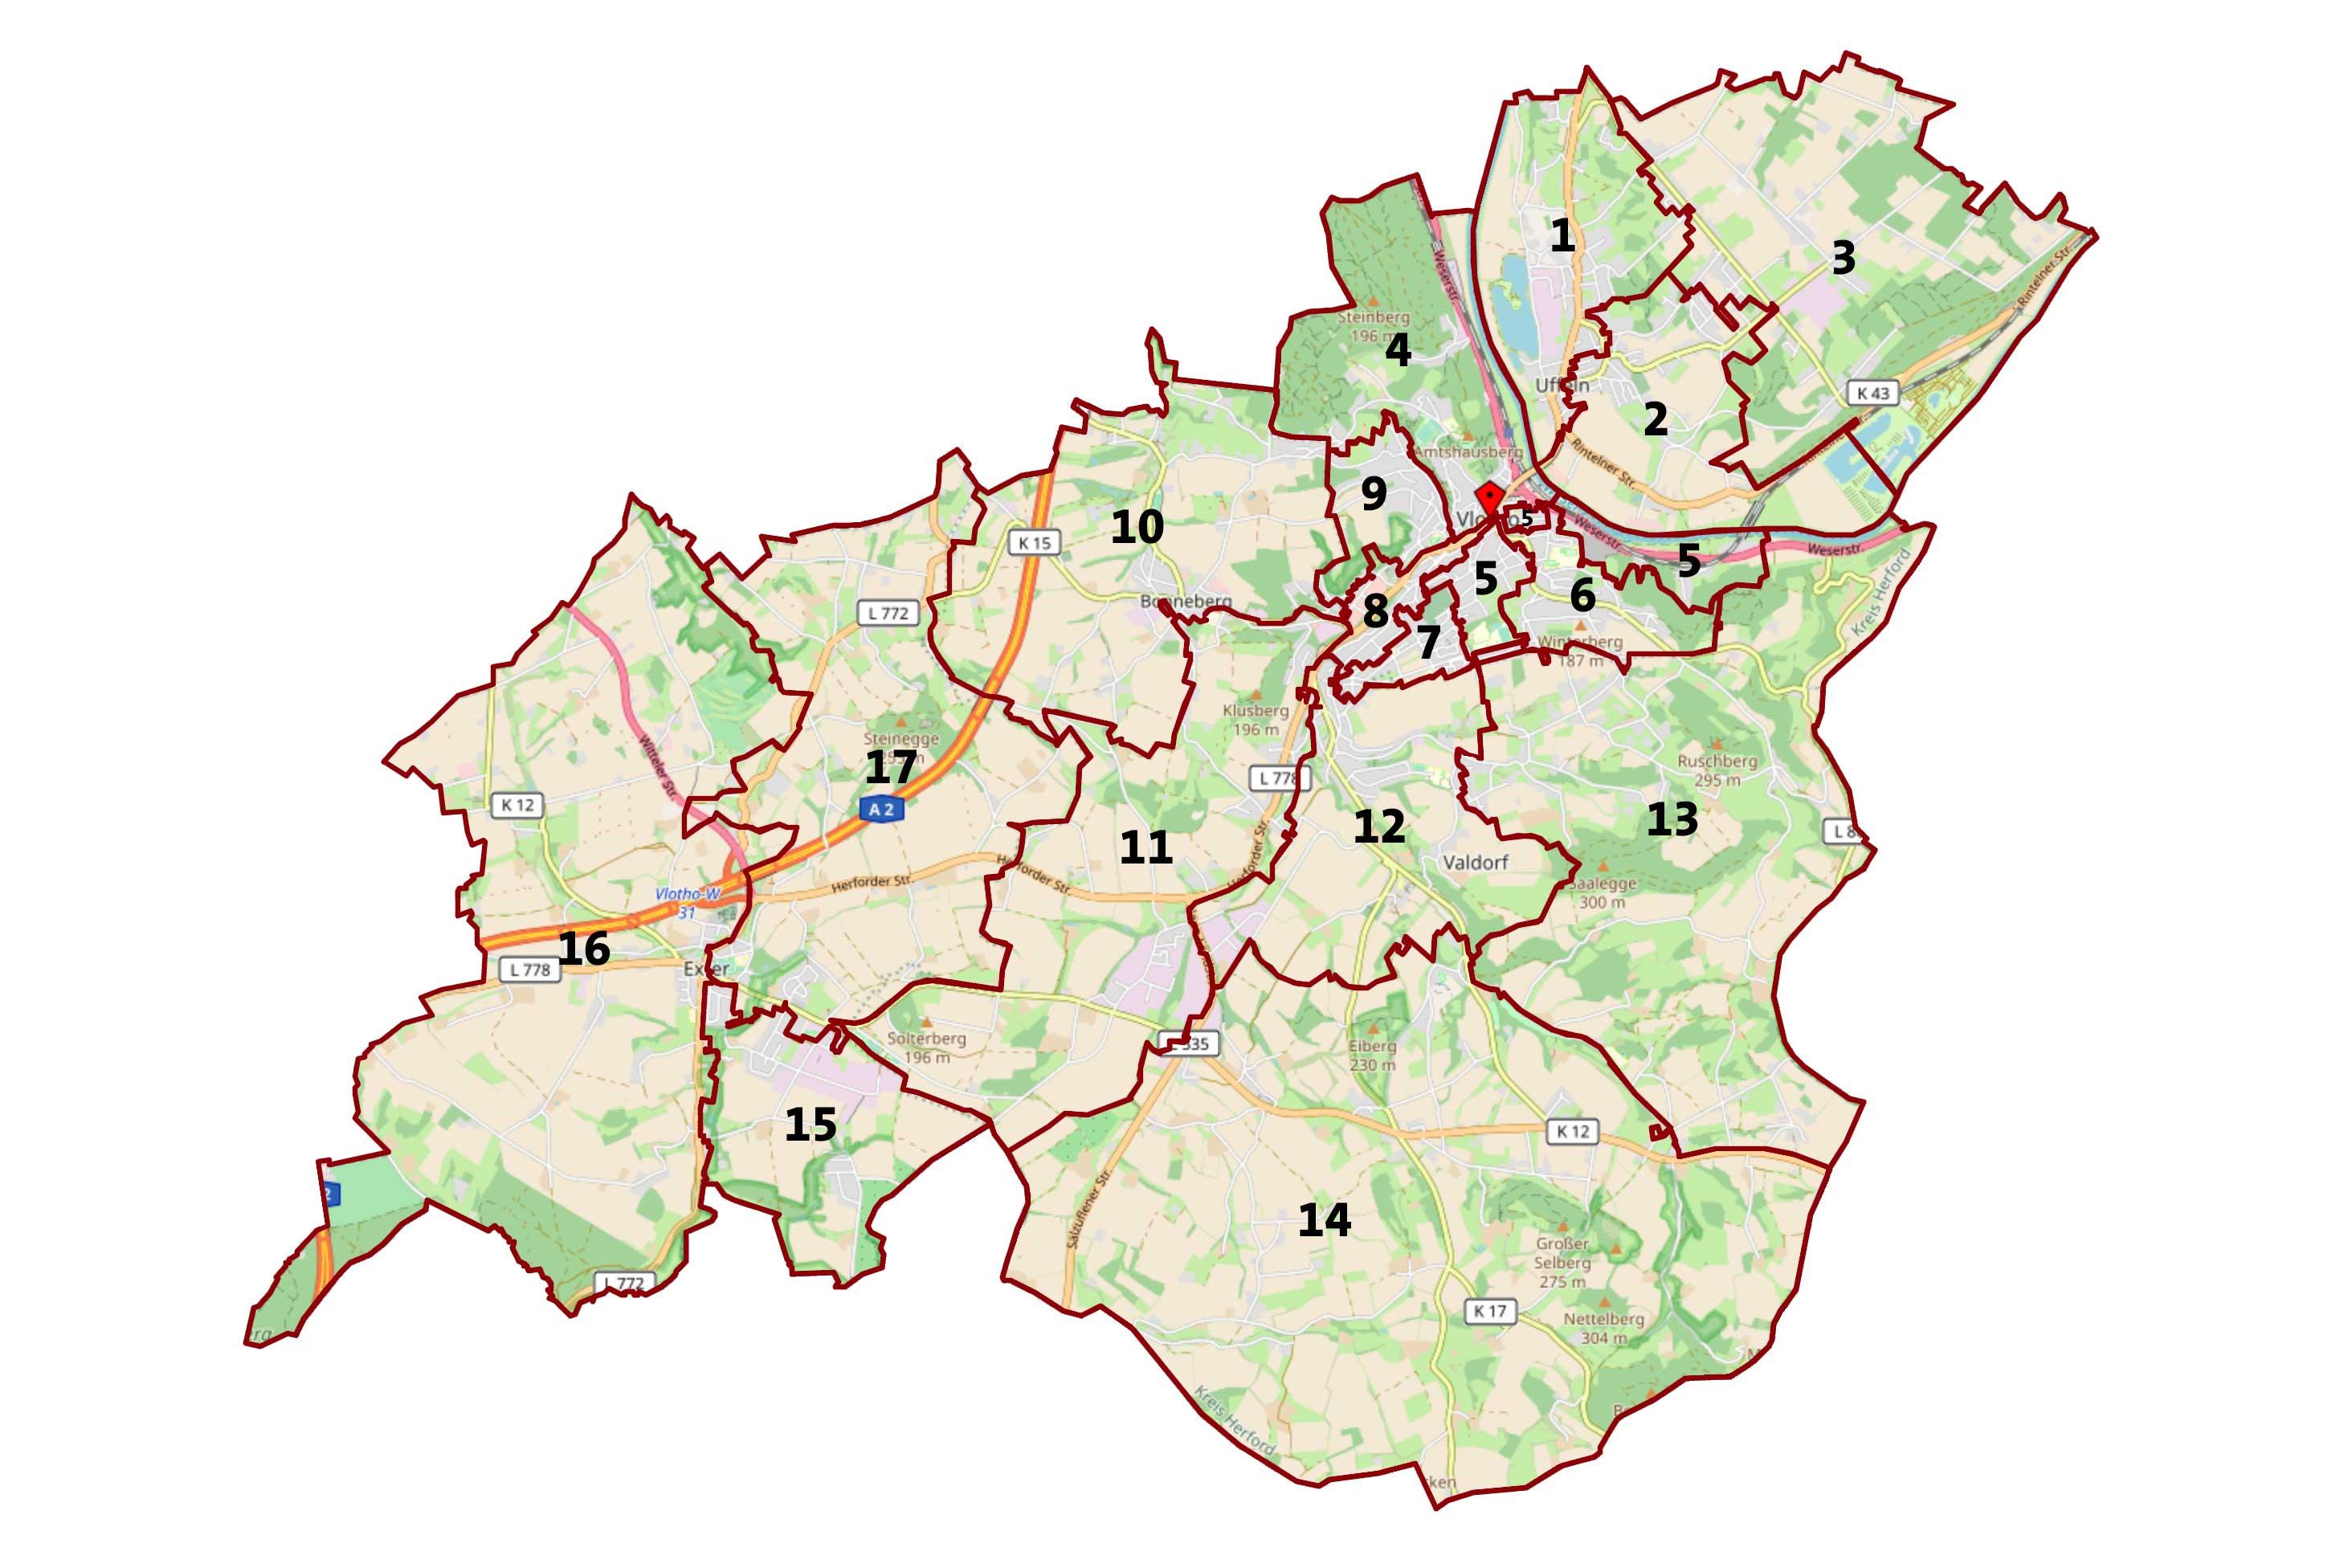 Karte_Bezirke